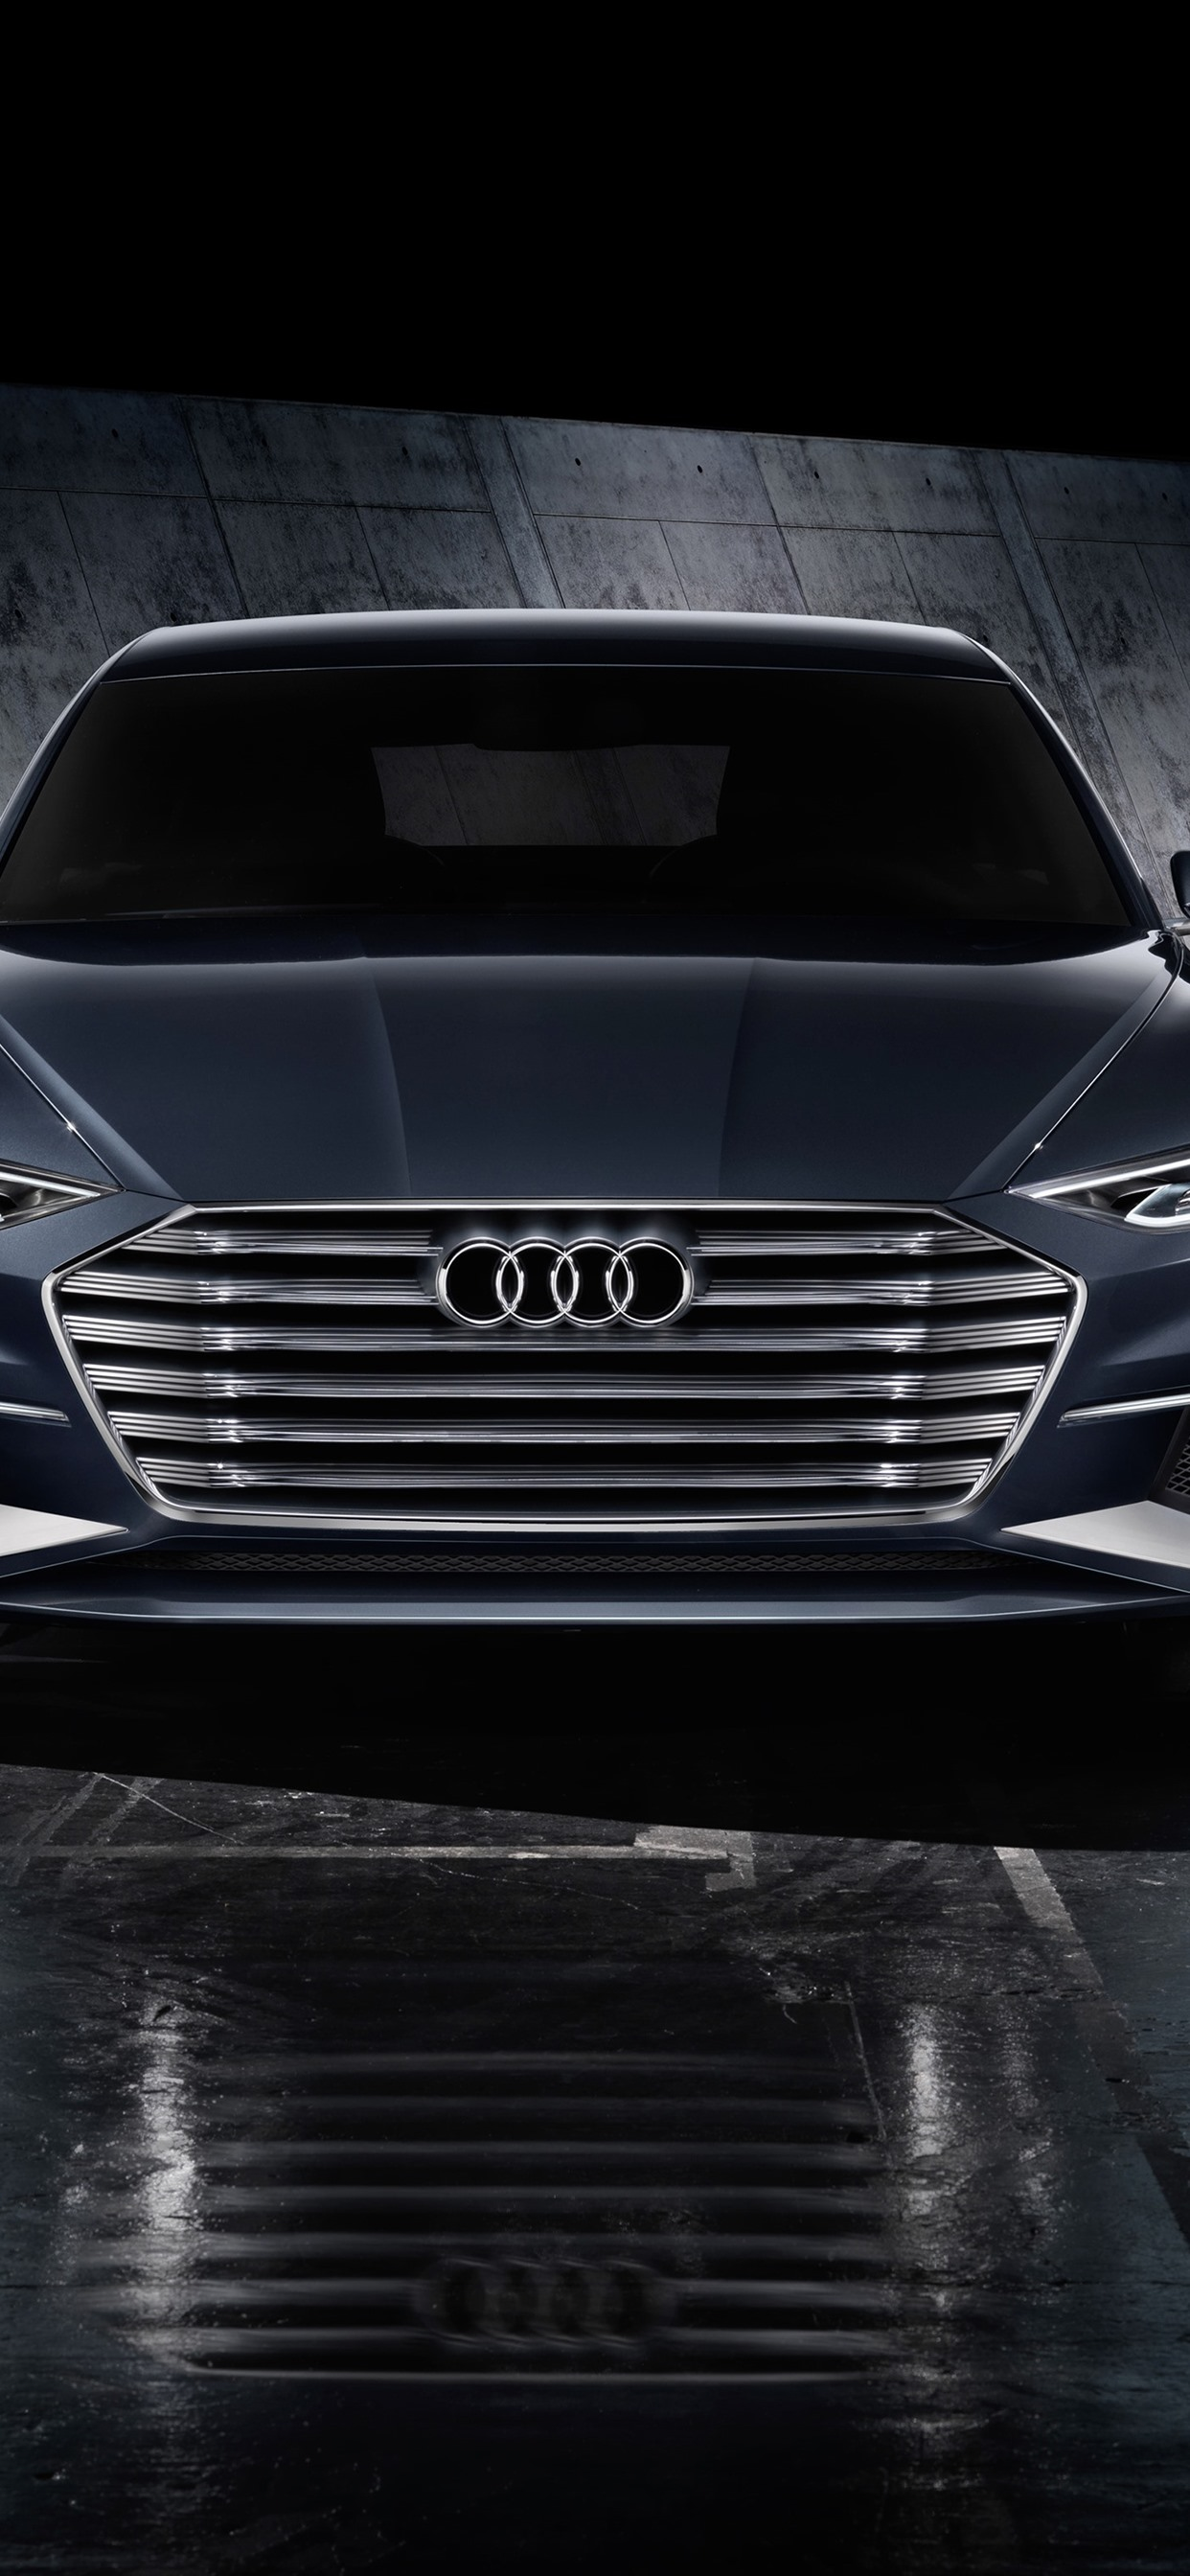 Audi A8 Wallpaper Phone , HD Wallpaper & Backgrounds